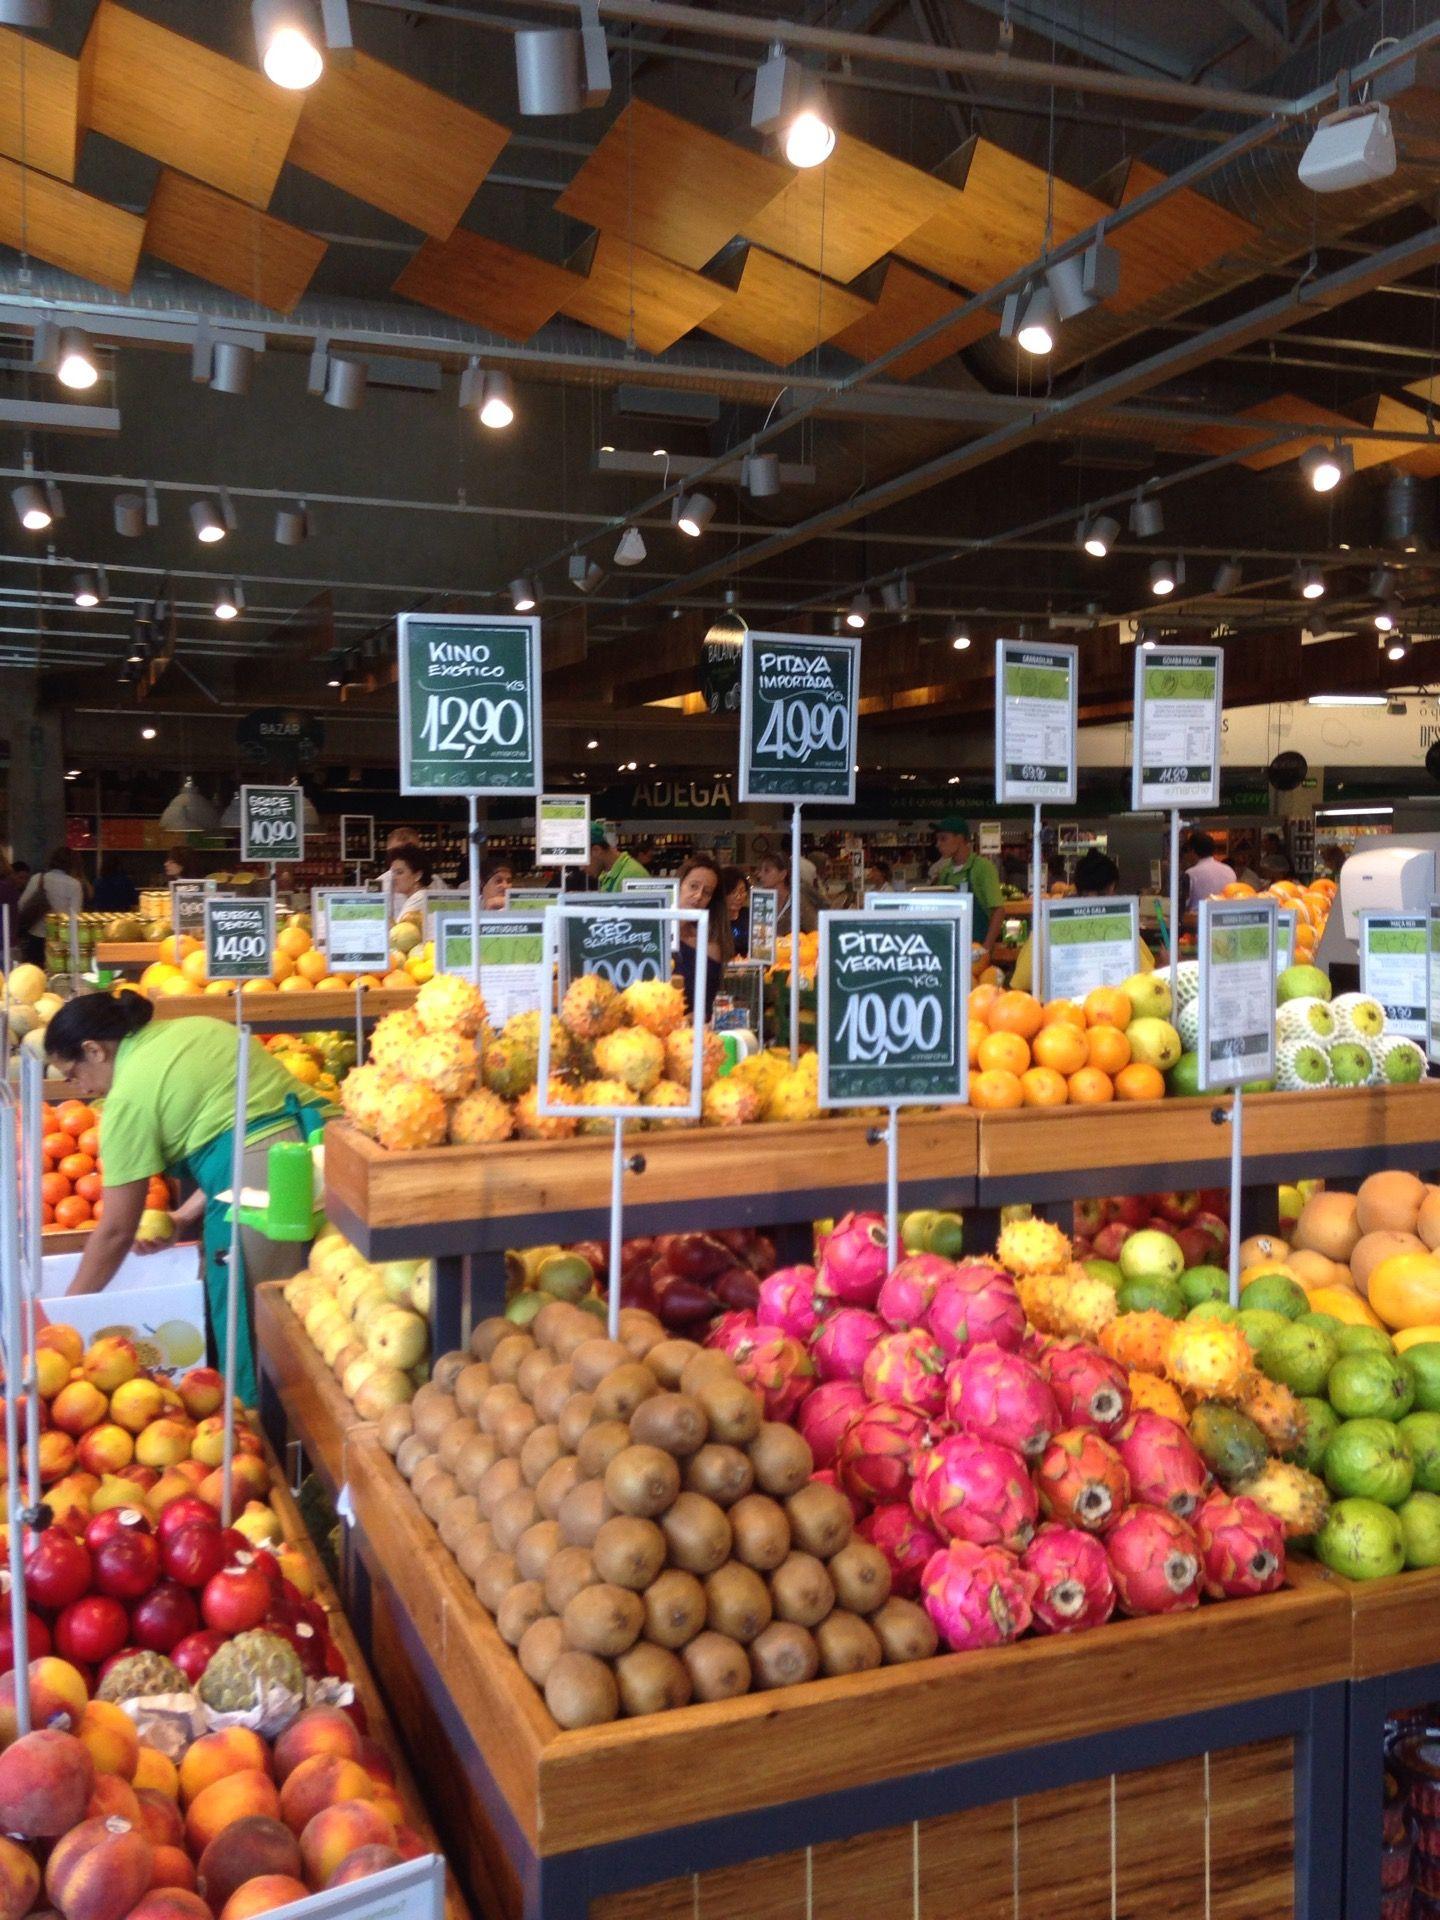 St Marché Expositores De Frutas Loja De Fruta Design De Supermercado